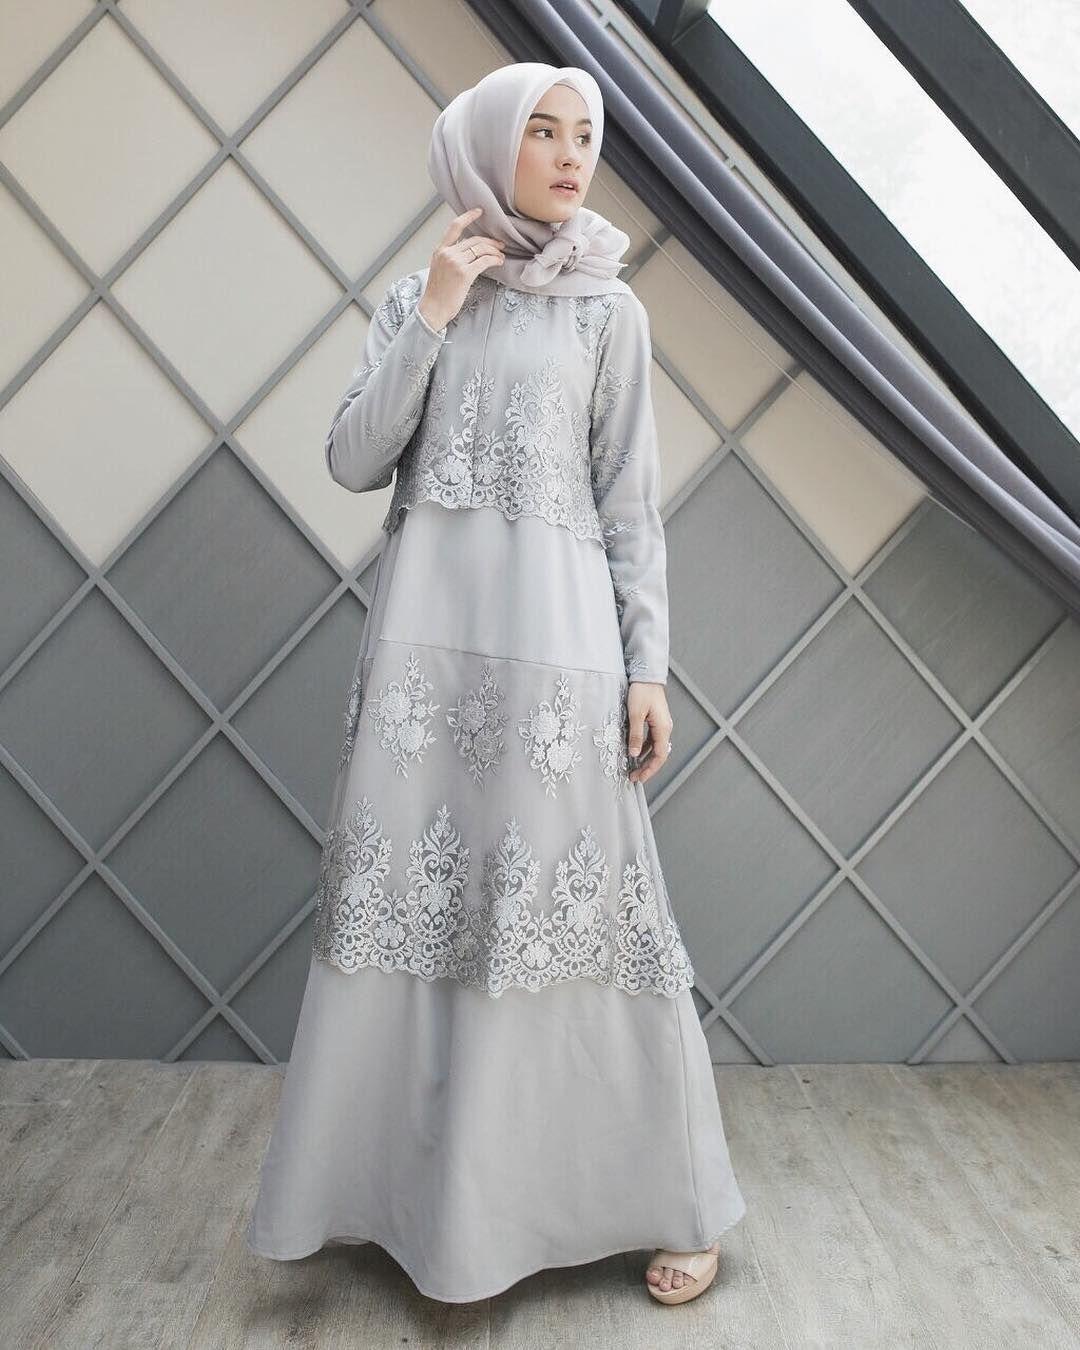 Model Baju Muslim Gamis Batik: Pin By Asiah On Muslimah Fashion & Hijab Style(Niqab) In